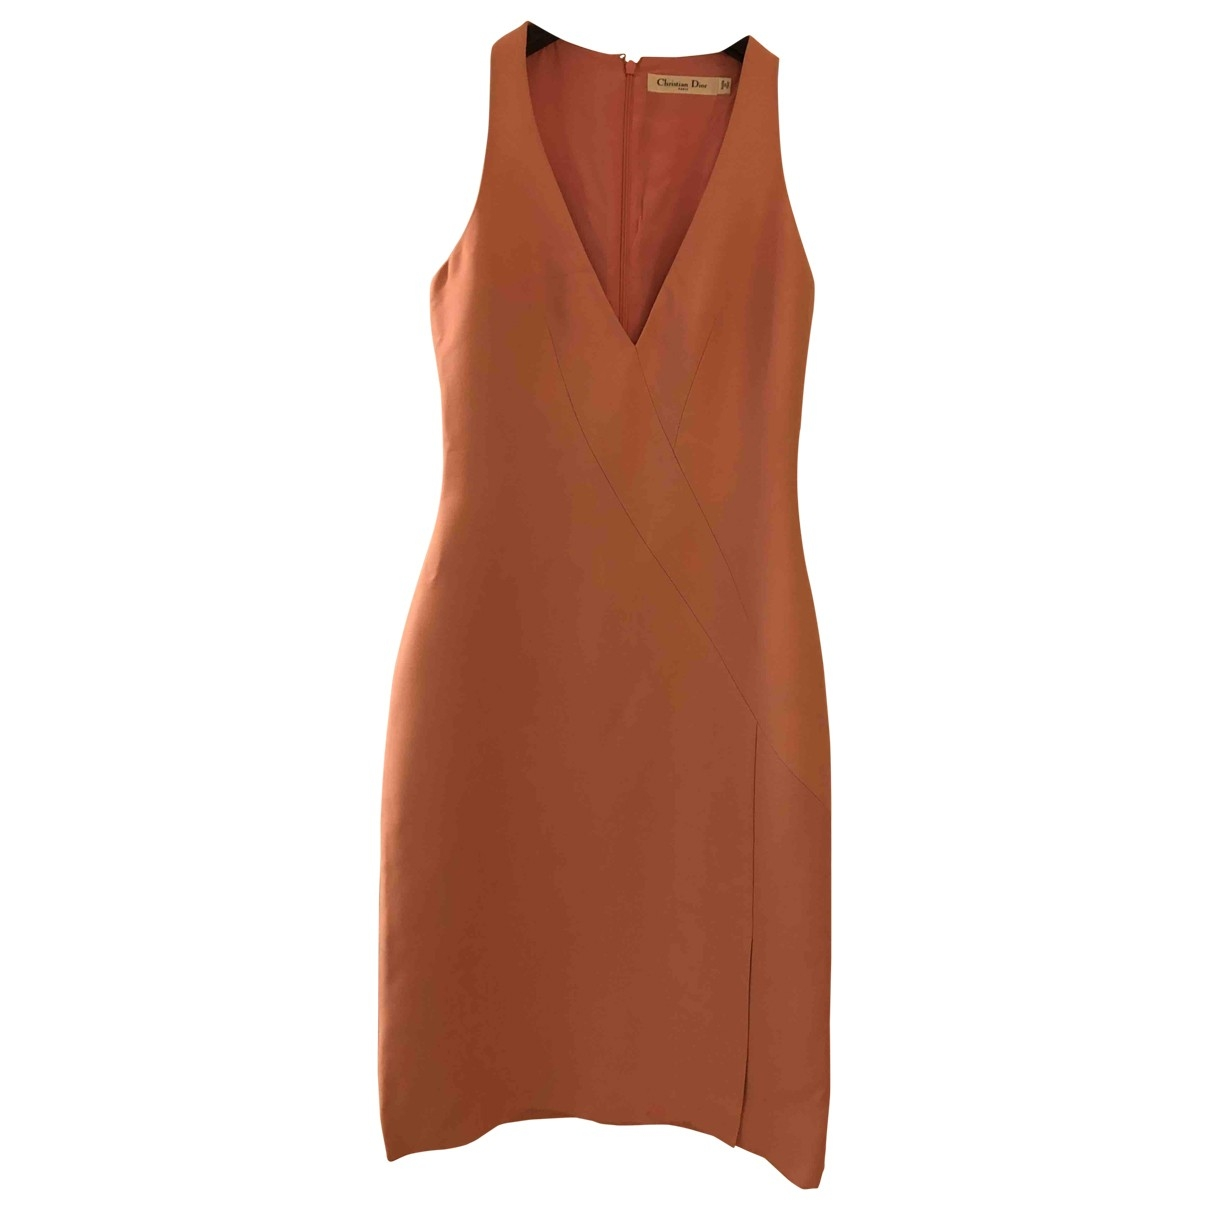 Christian Dior \N Pink Wool dress for Women 36 FR